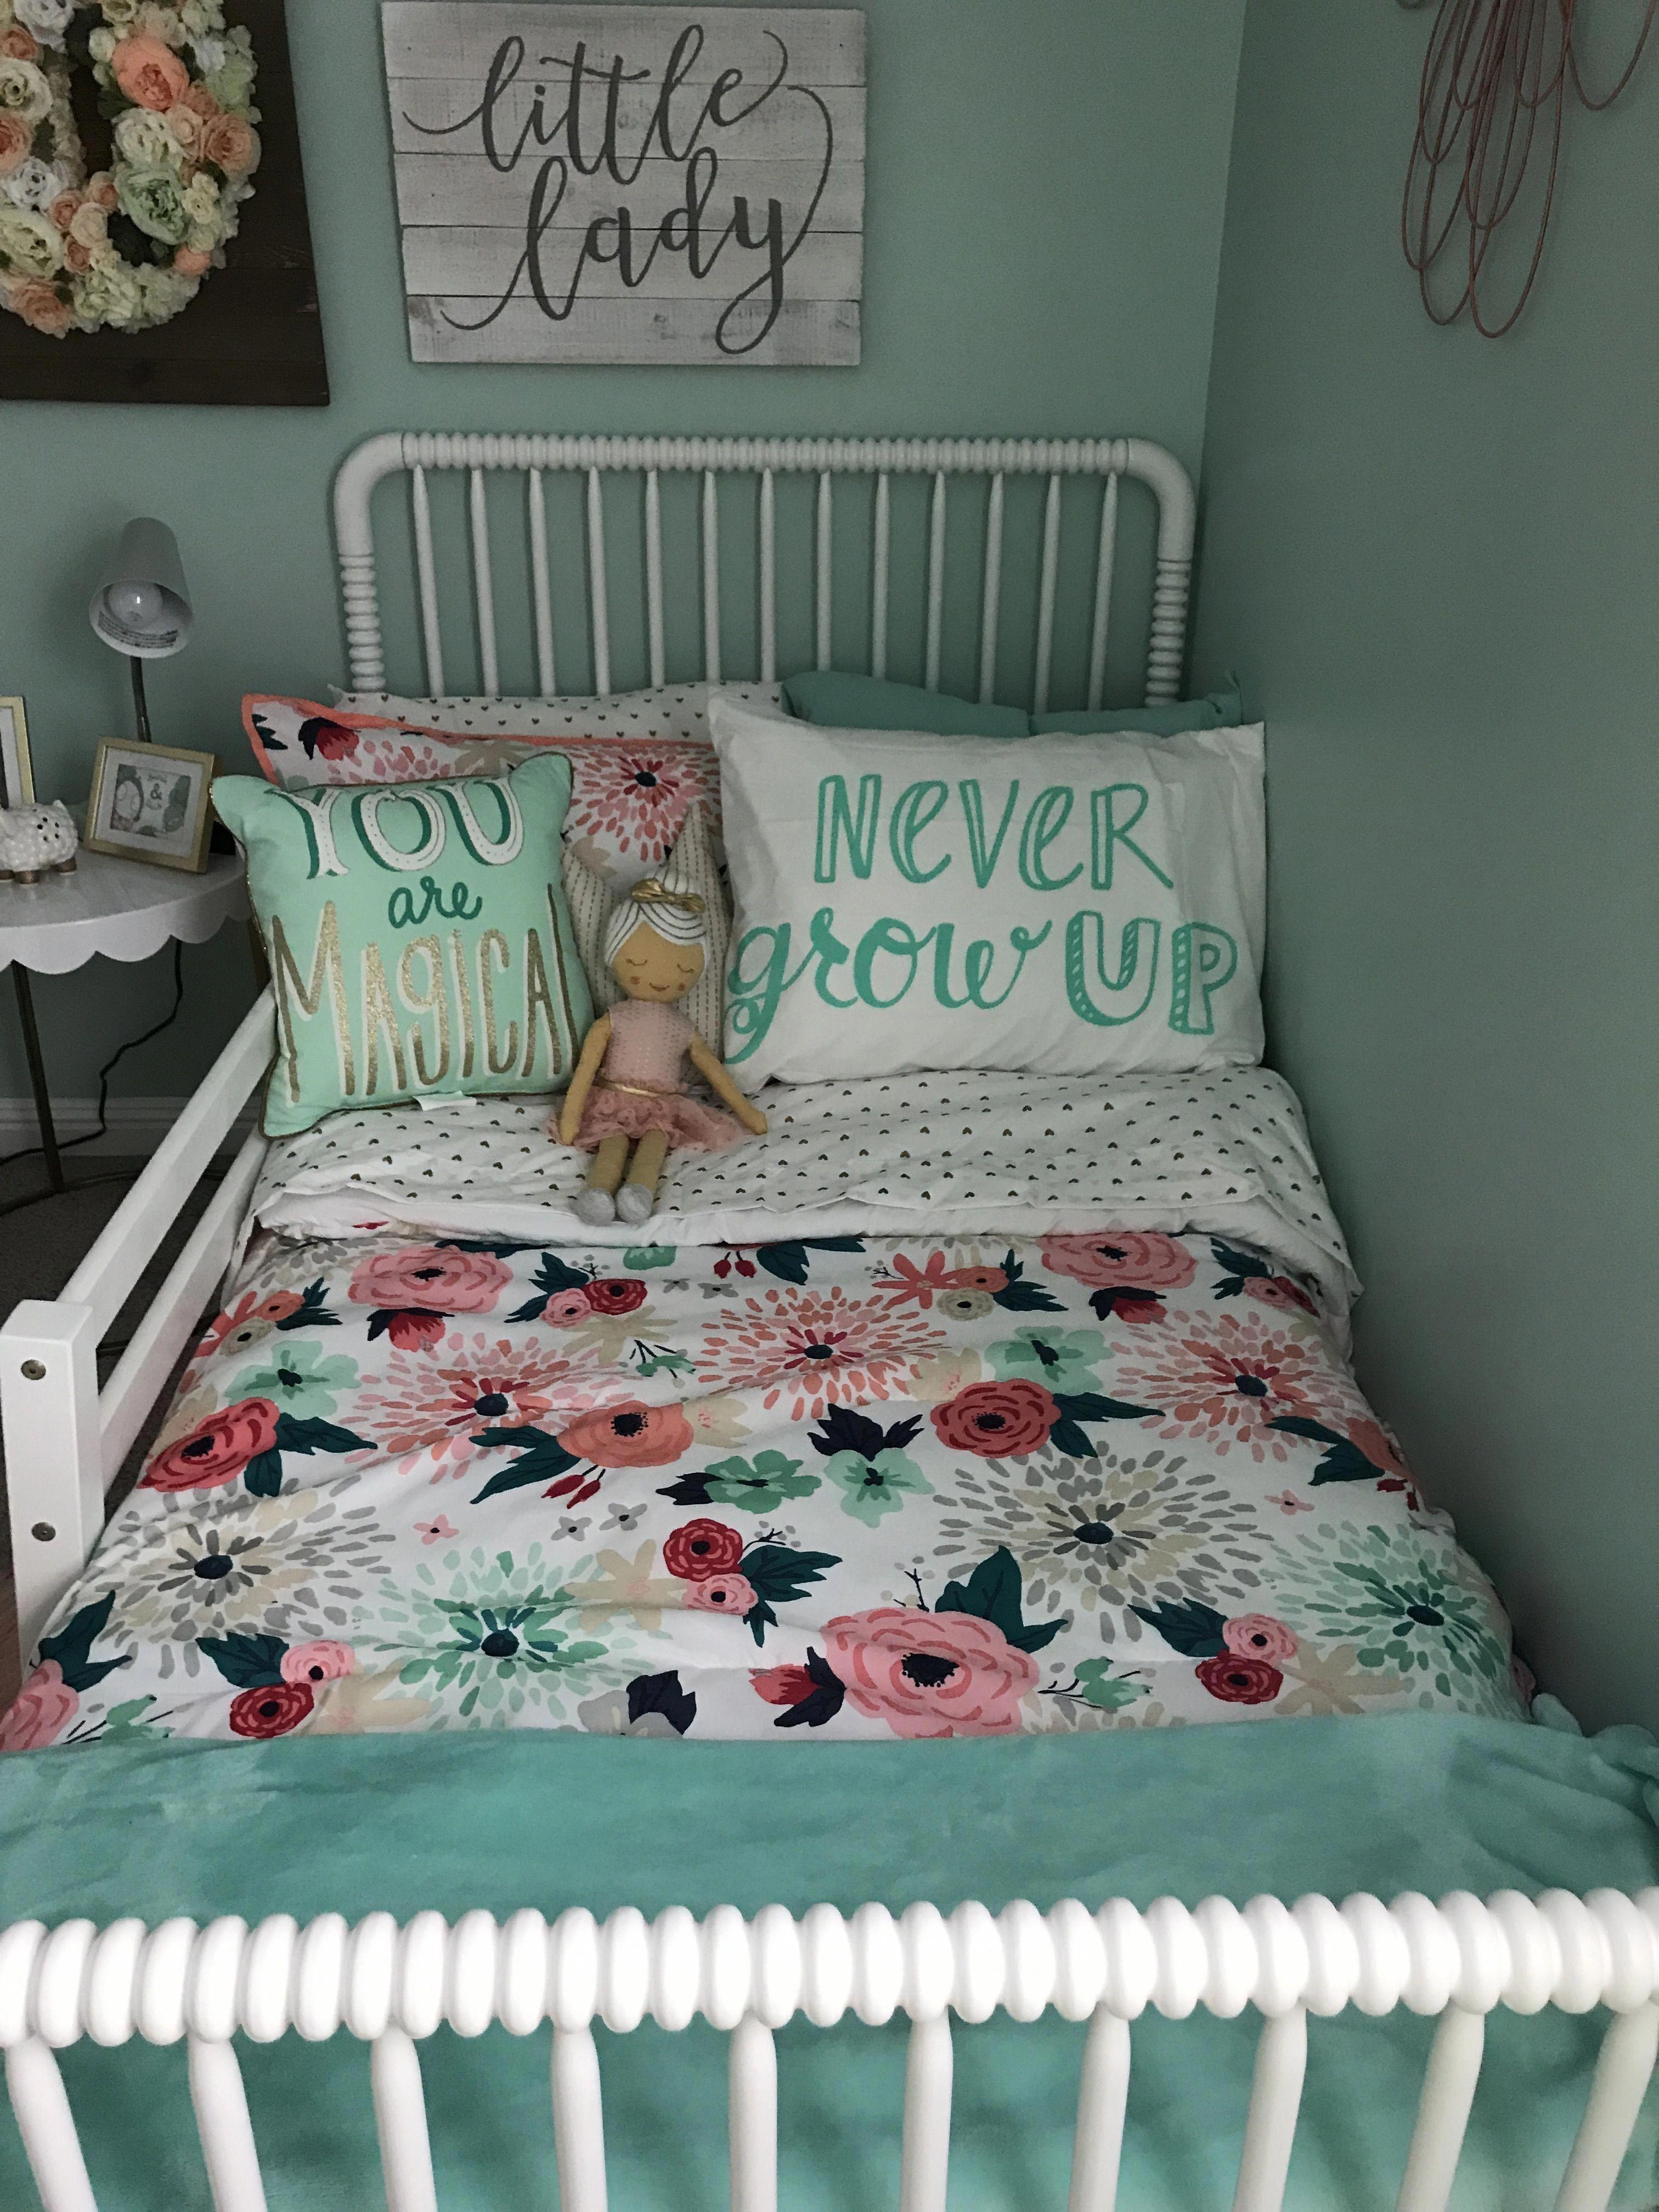 outstanding teen girl bedroom ideas | This teenage girls room is undeniably an outstanding ...